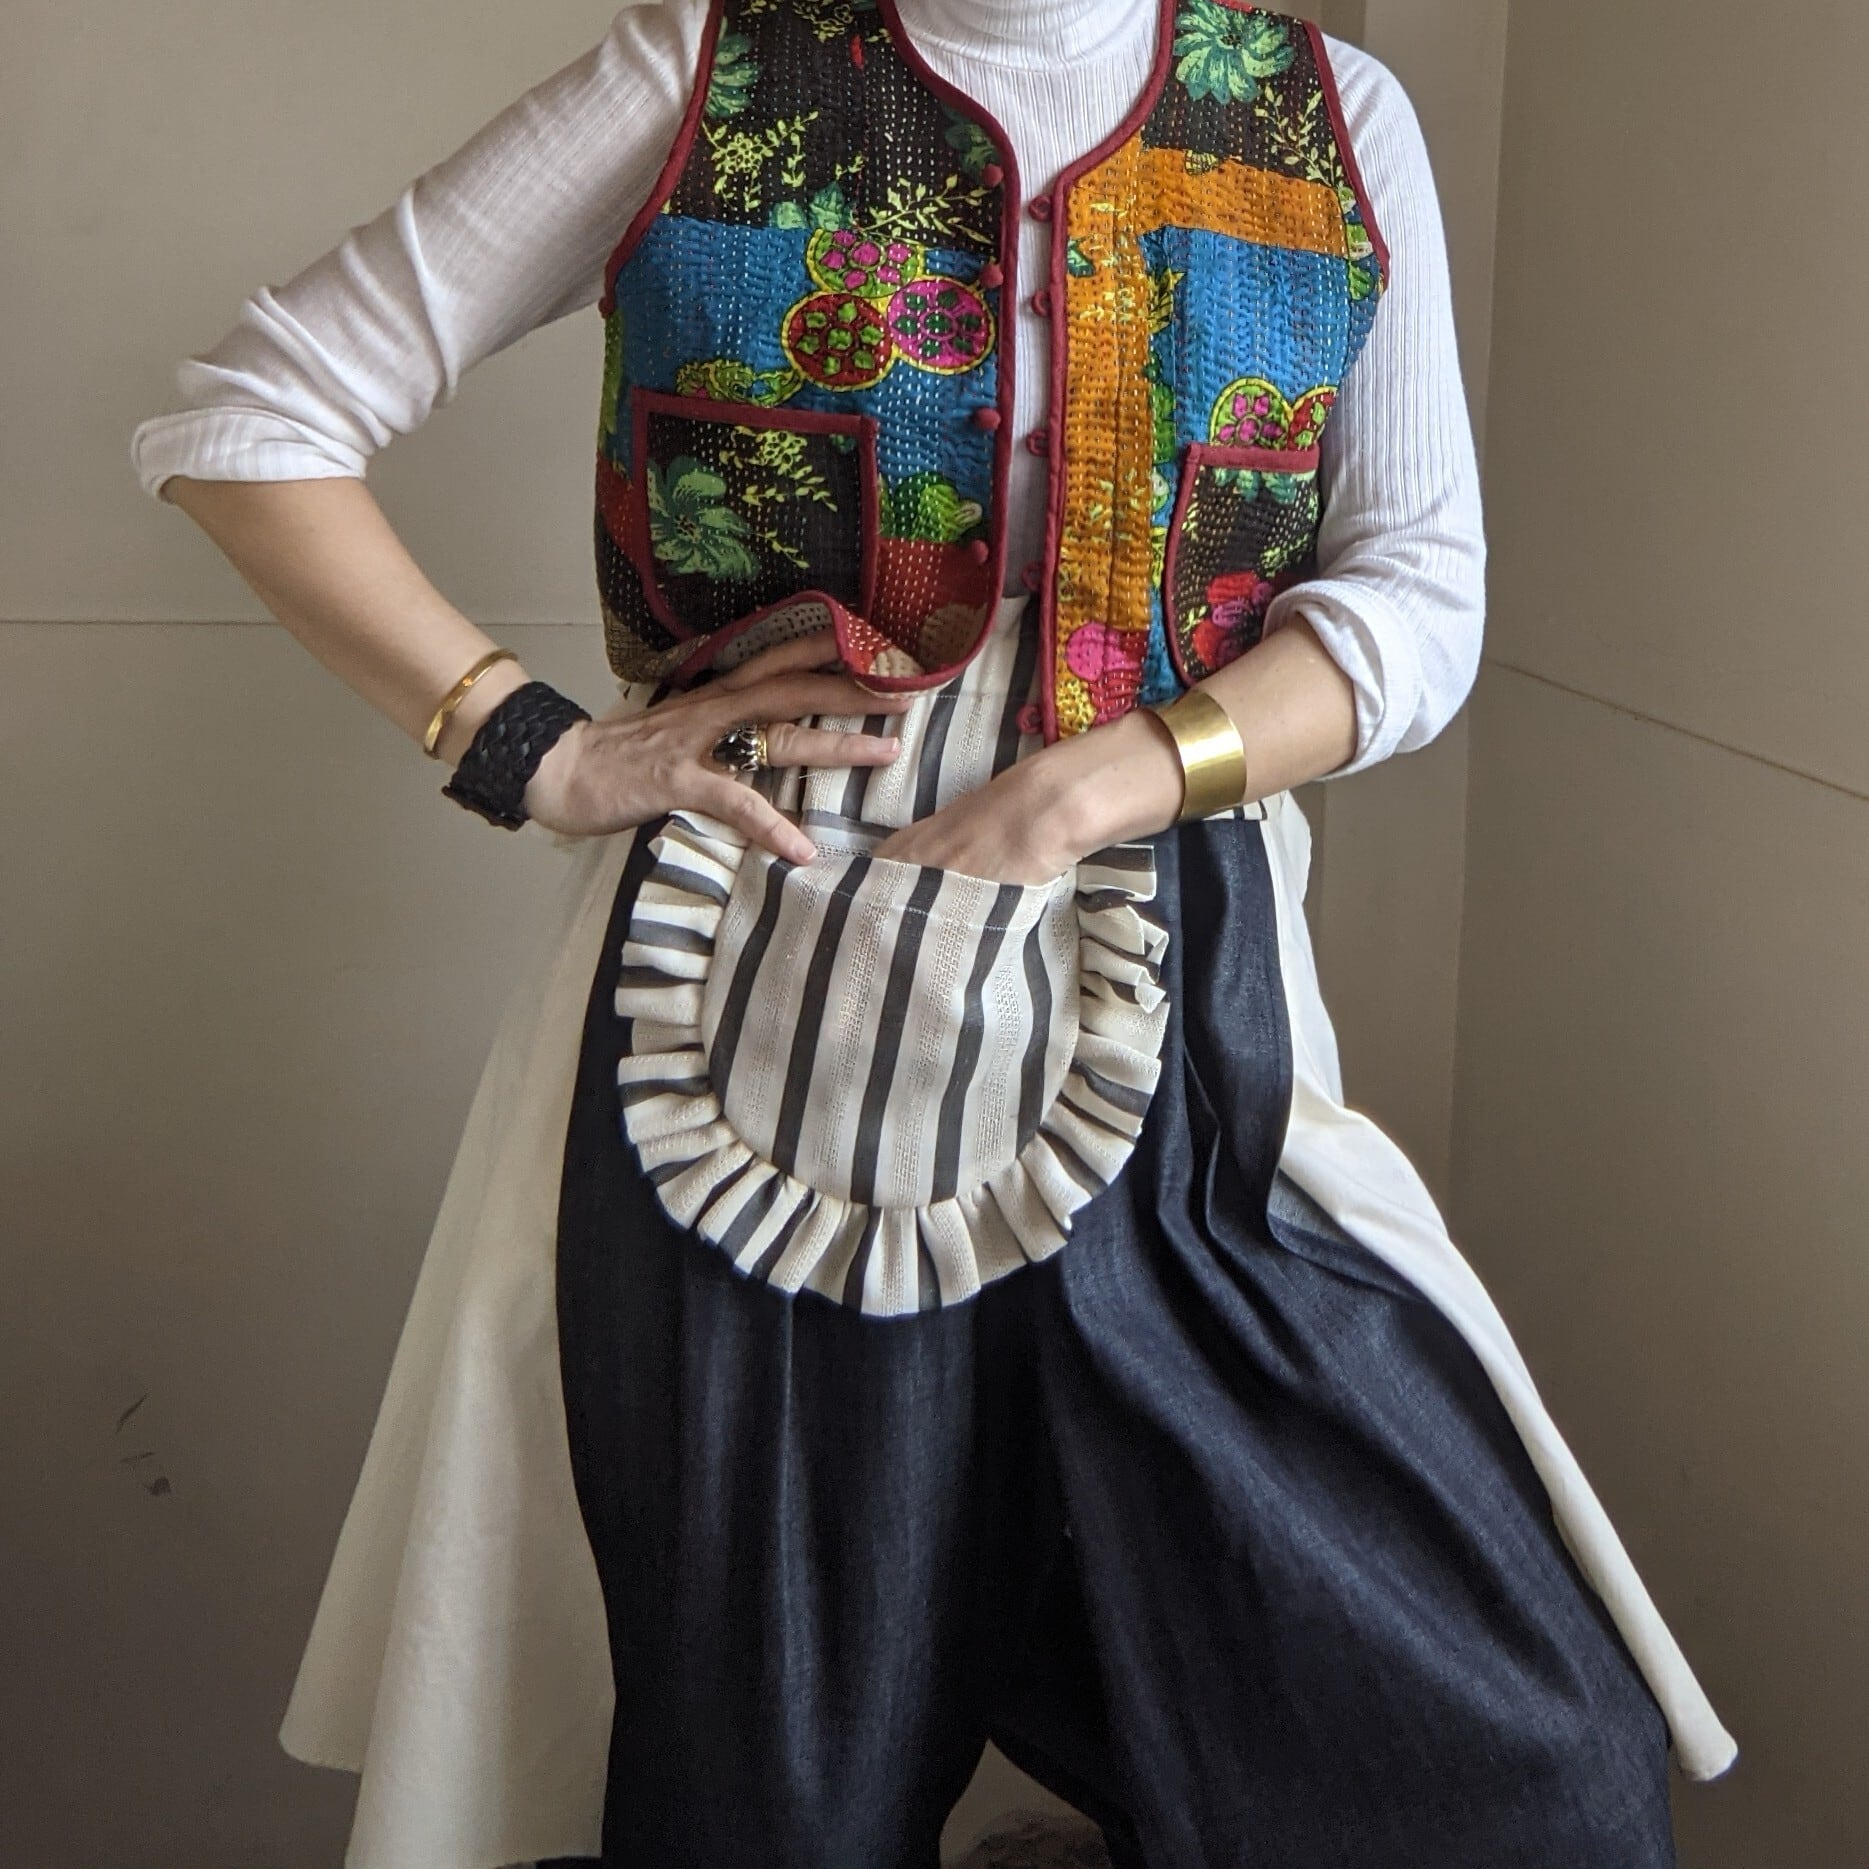 【 HOUGA 】ホウガ / emily bib pocket / white×black / ウエストベルト / ポケット